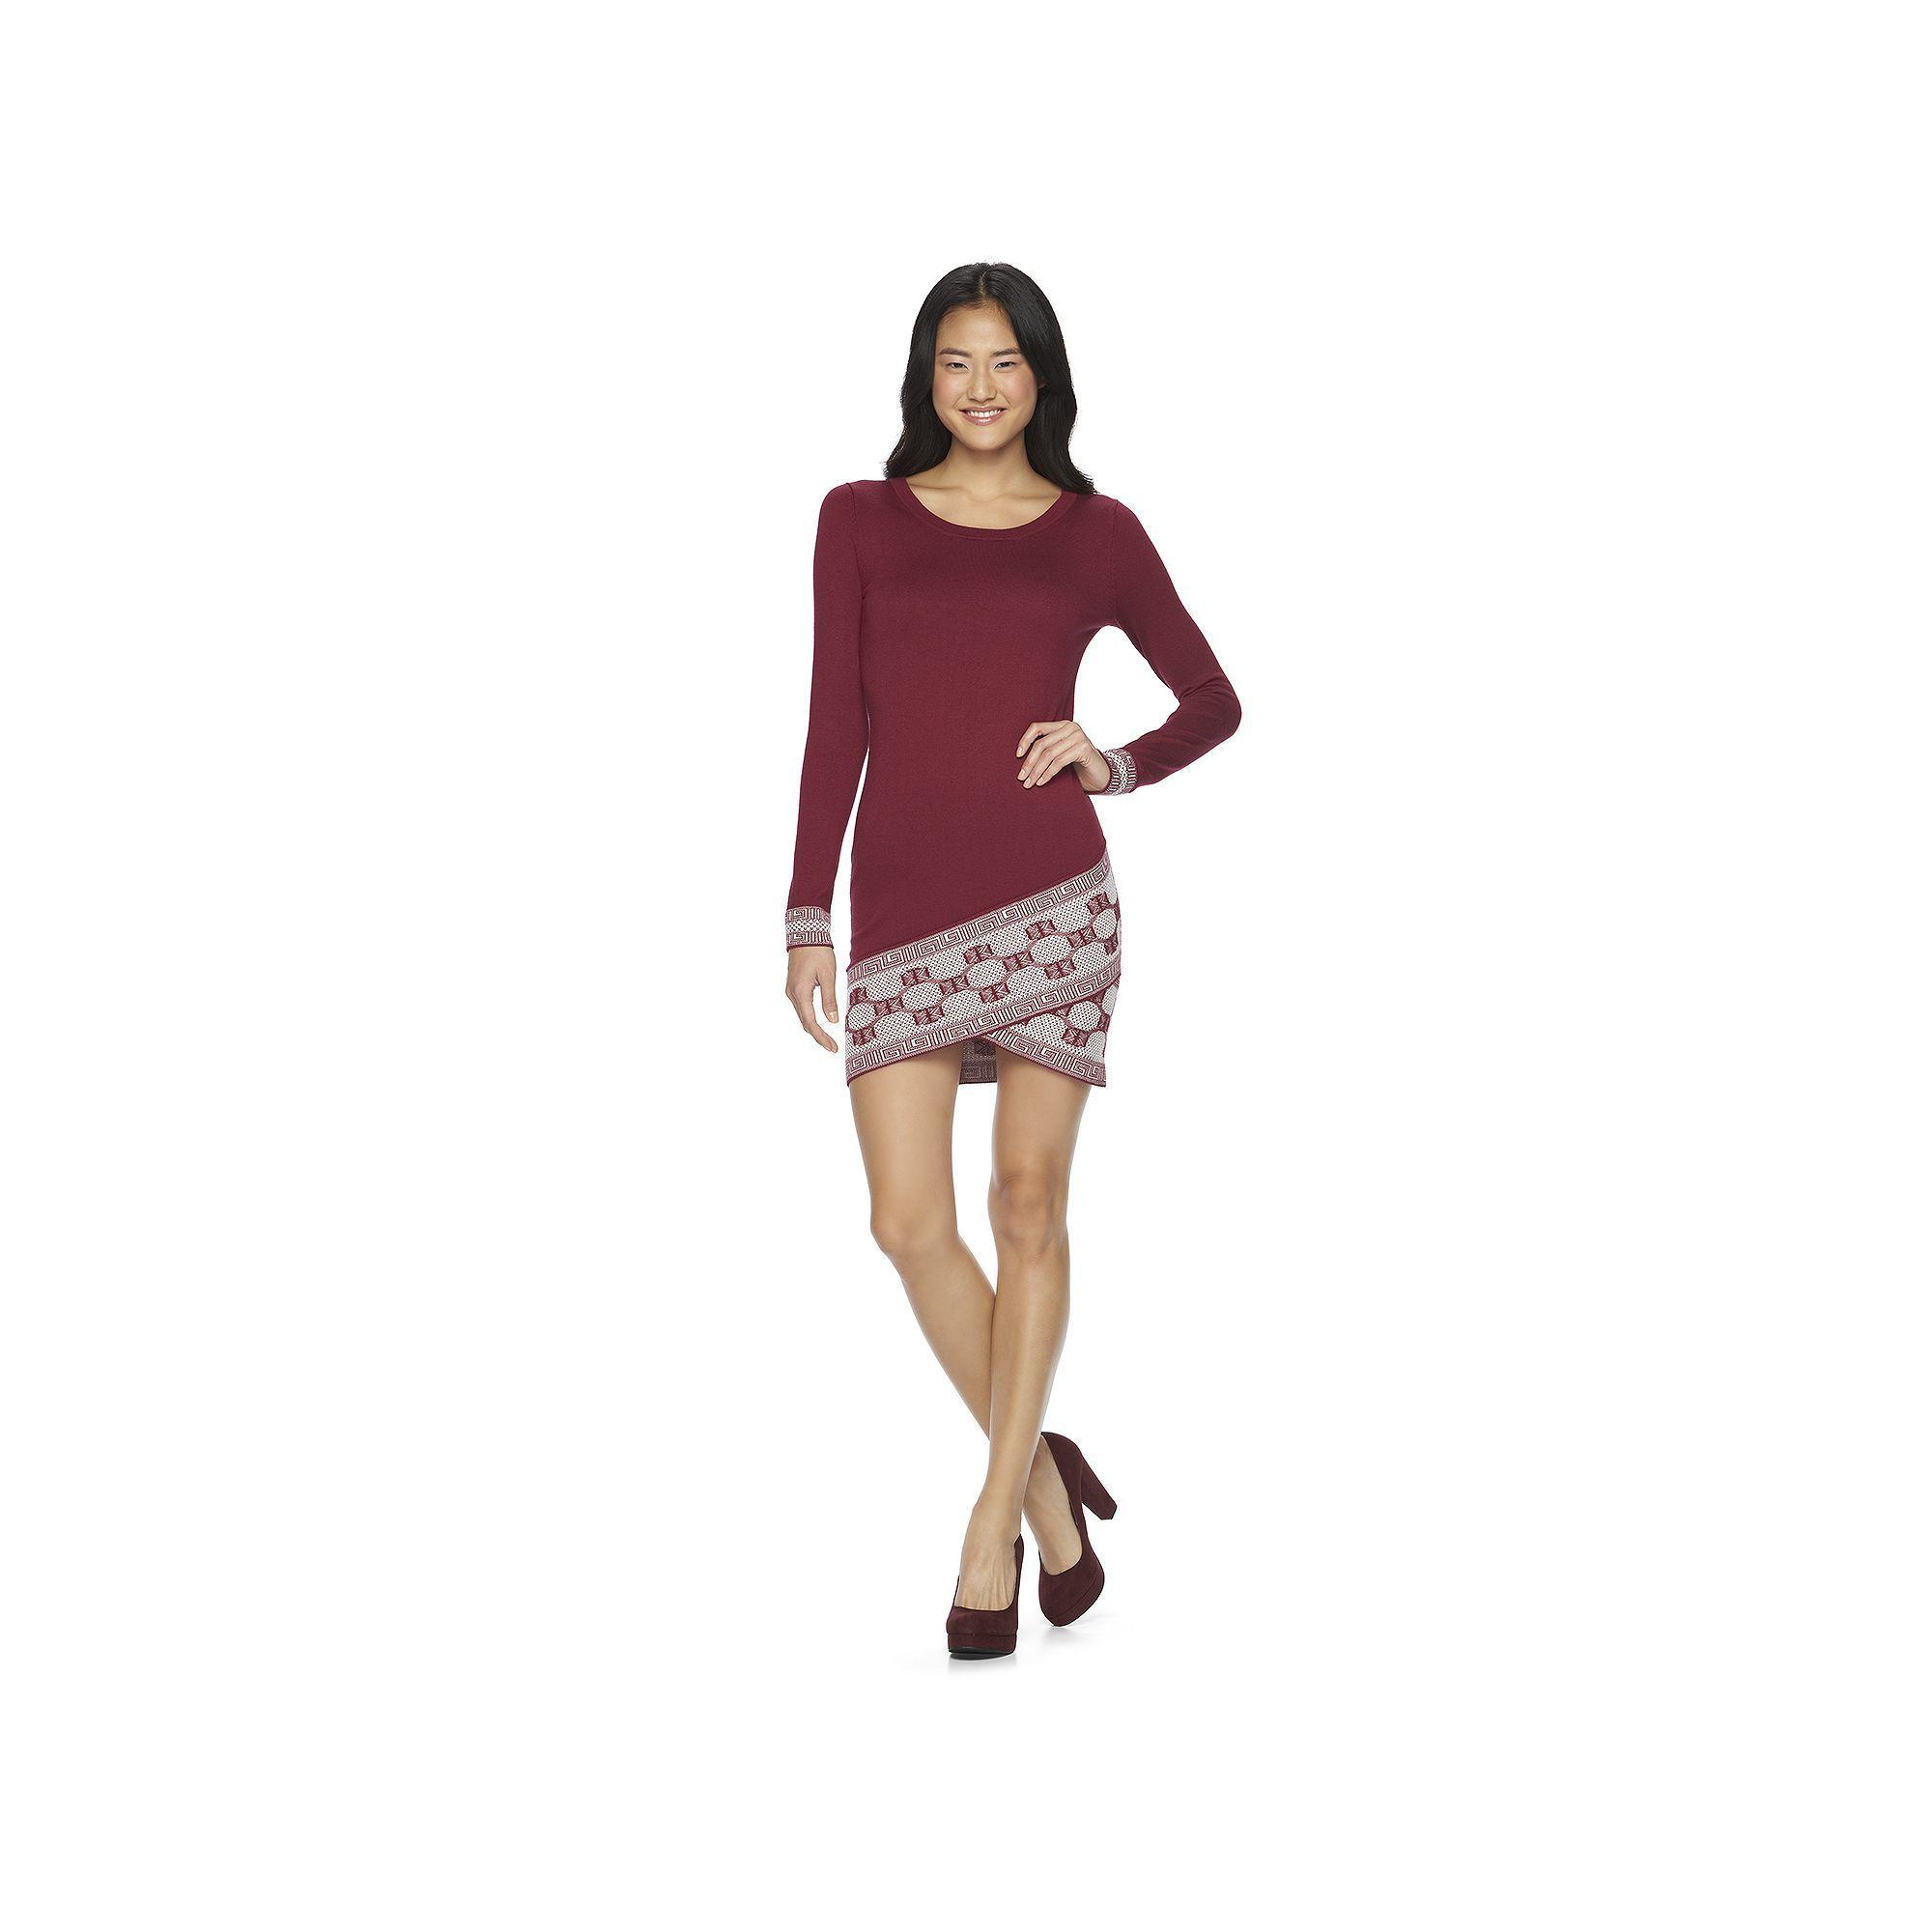 Juniorsu Freshman Asymmetrical Geometric Print Dress Teens Size